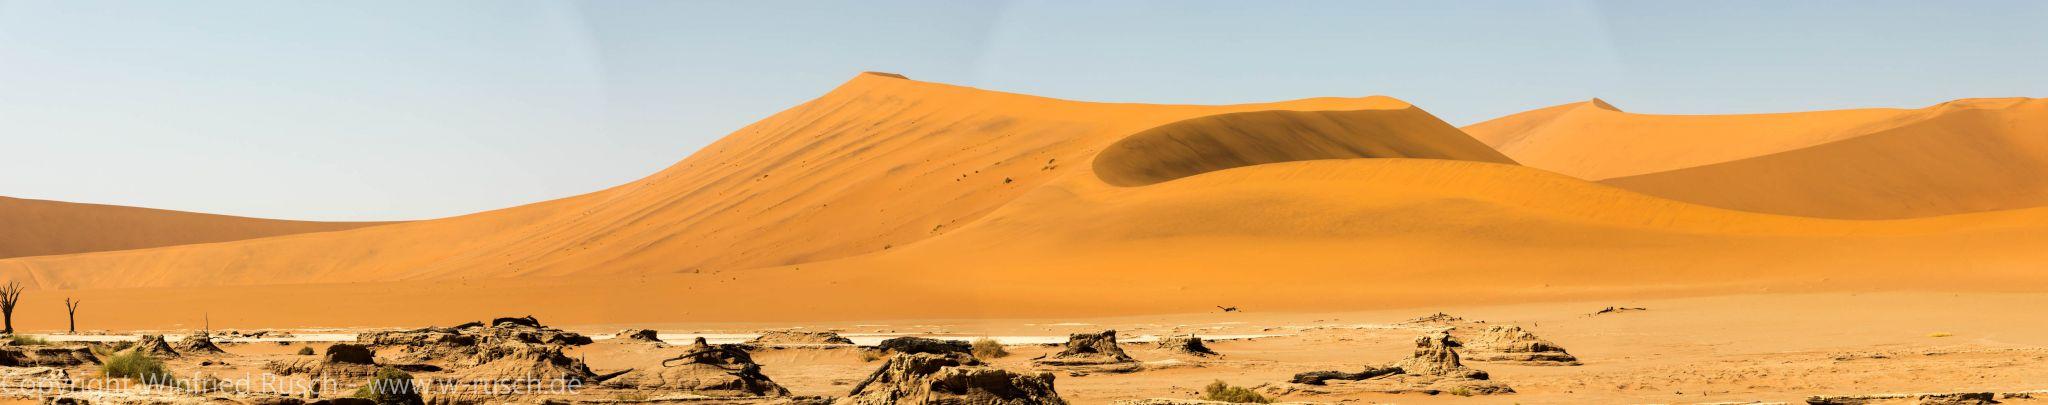 Dünenlandschaft in Namibia, Namibia